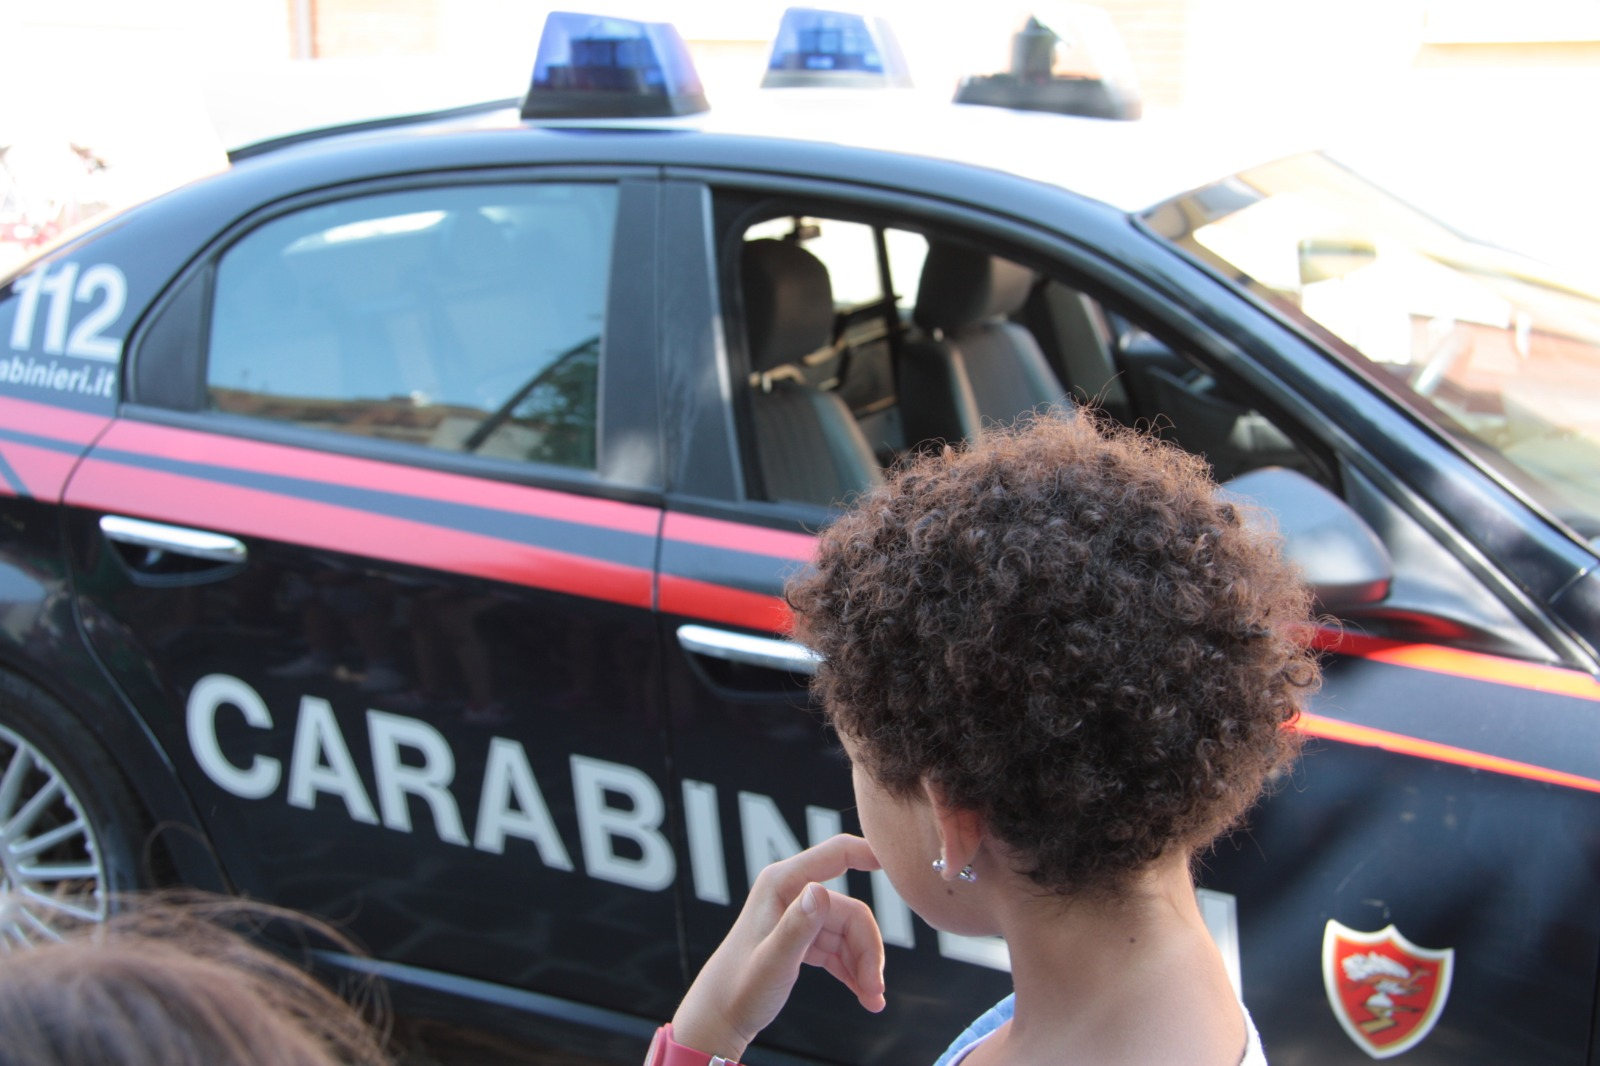 Carabinieri (12)